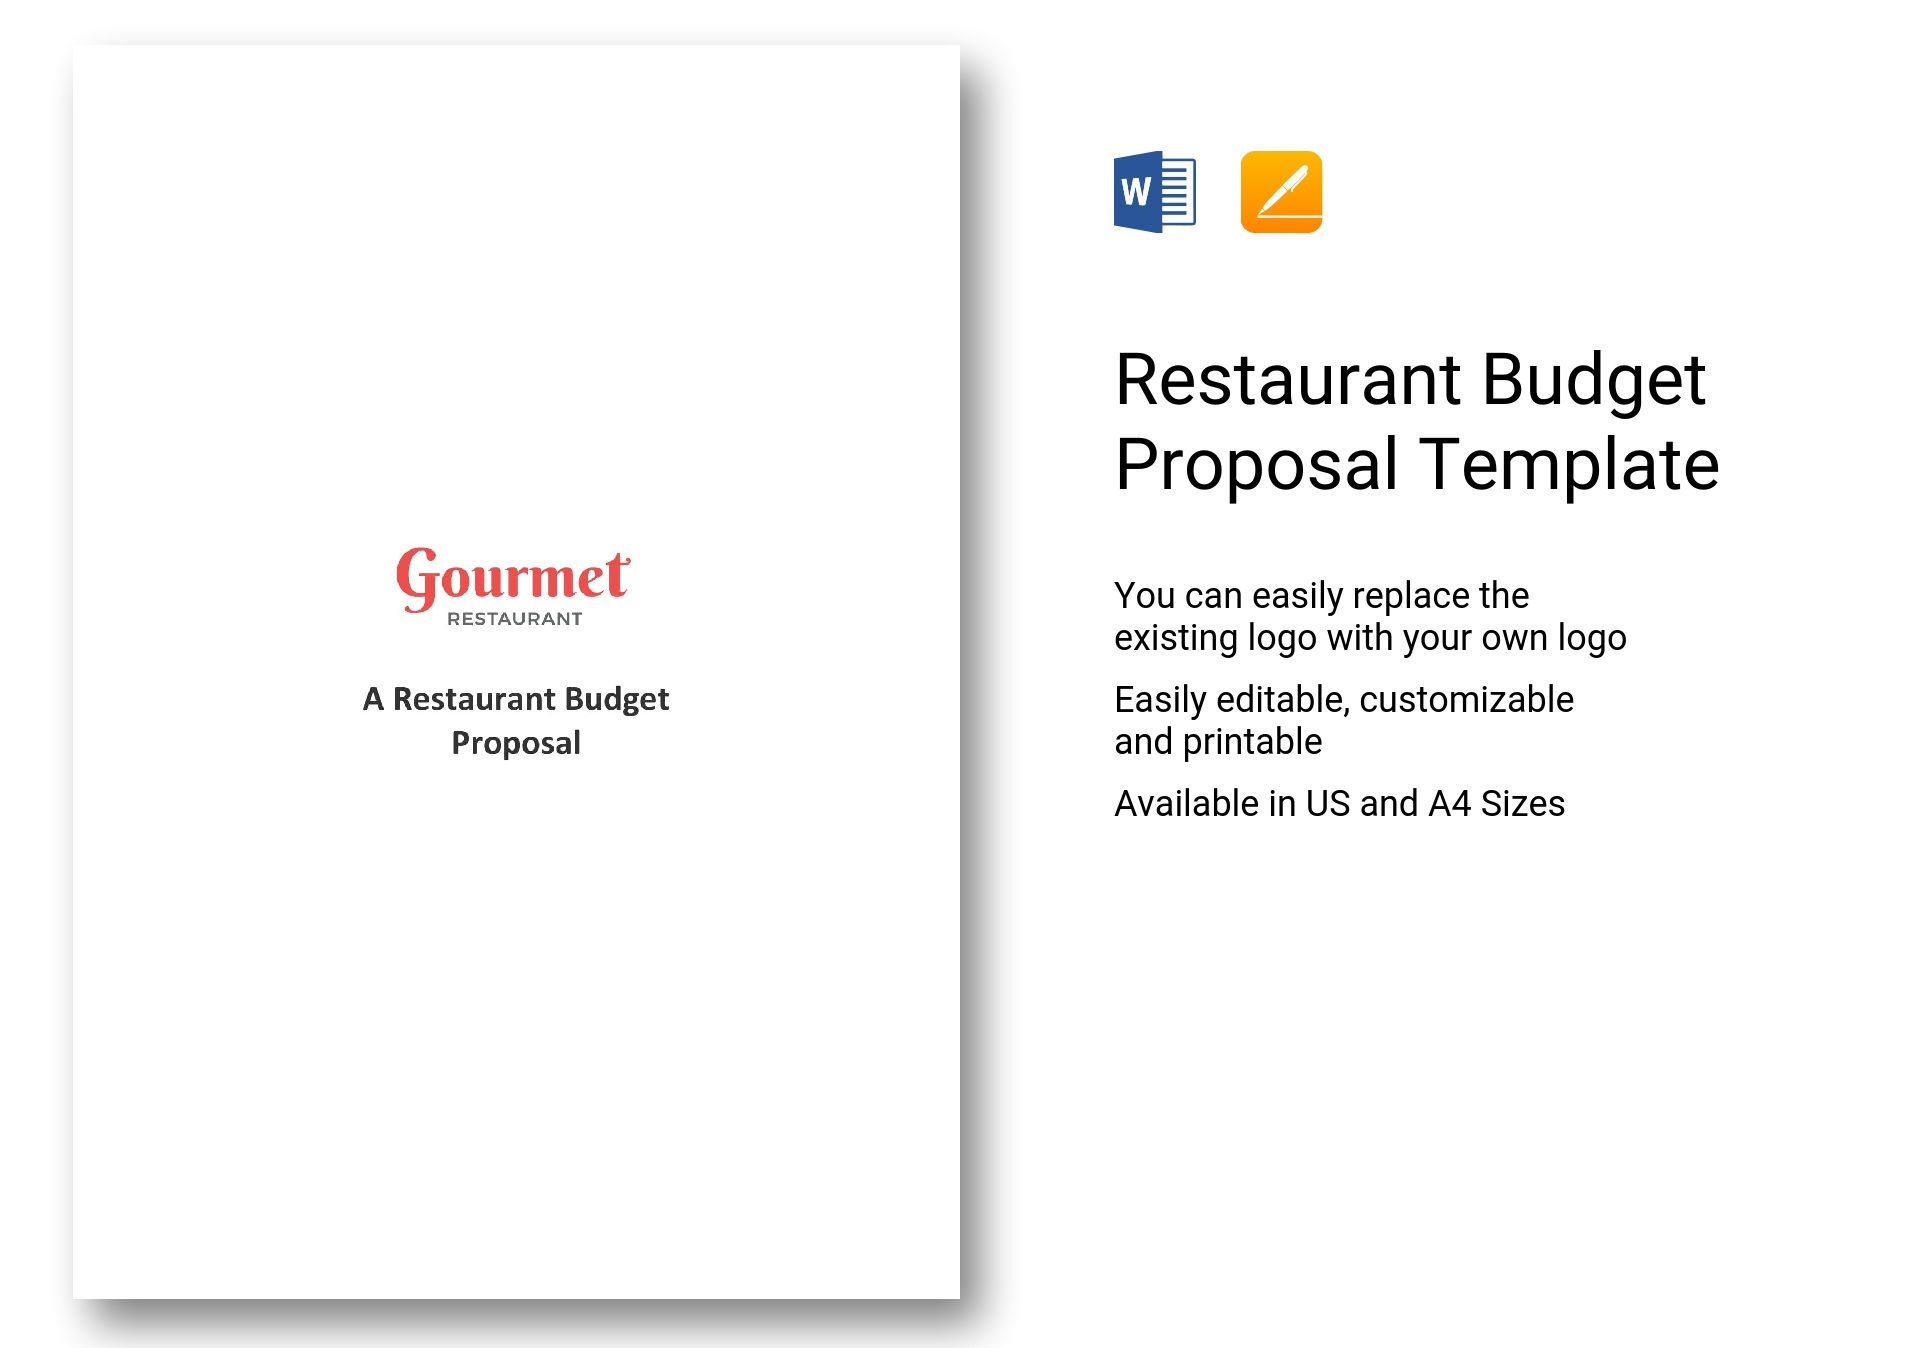 Restaurant Budget Proposal